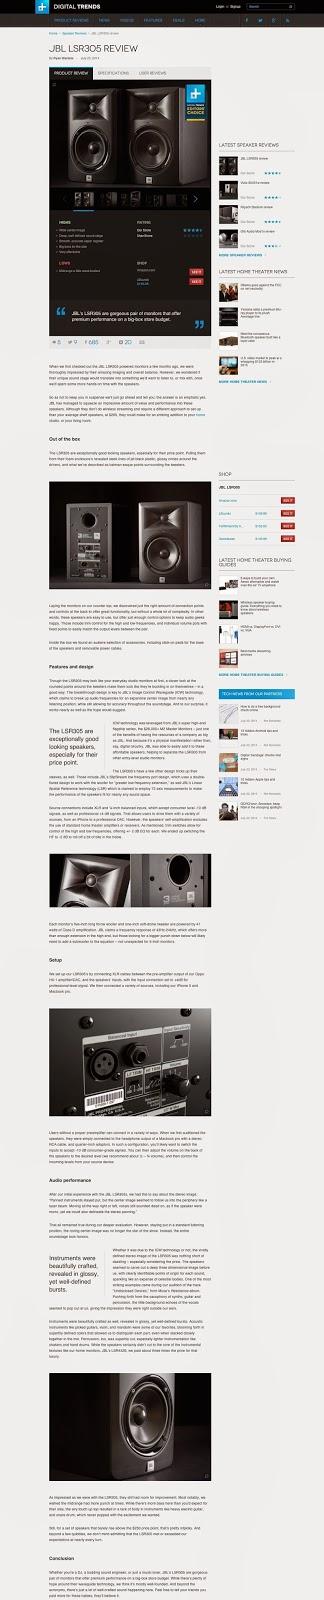 http://www.digitaltrends.com/speaker-reviews/jbl-lsr305-review/#!bxXXm6